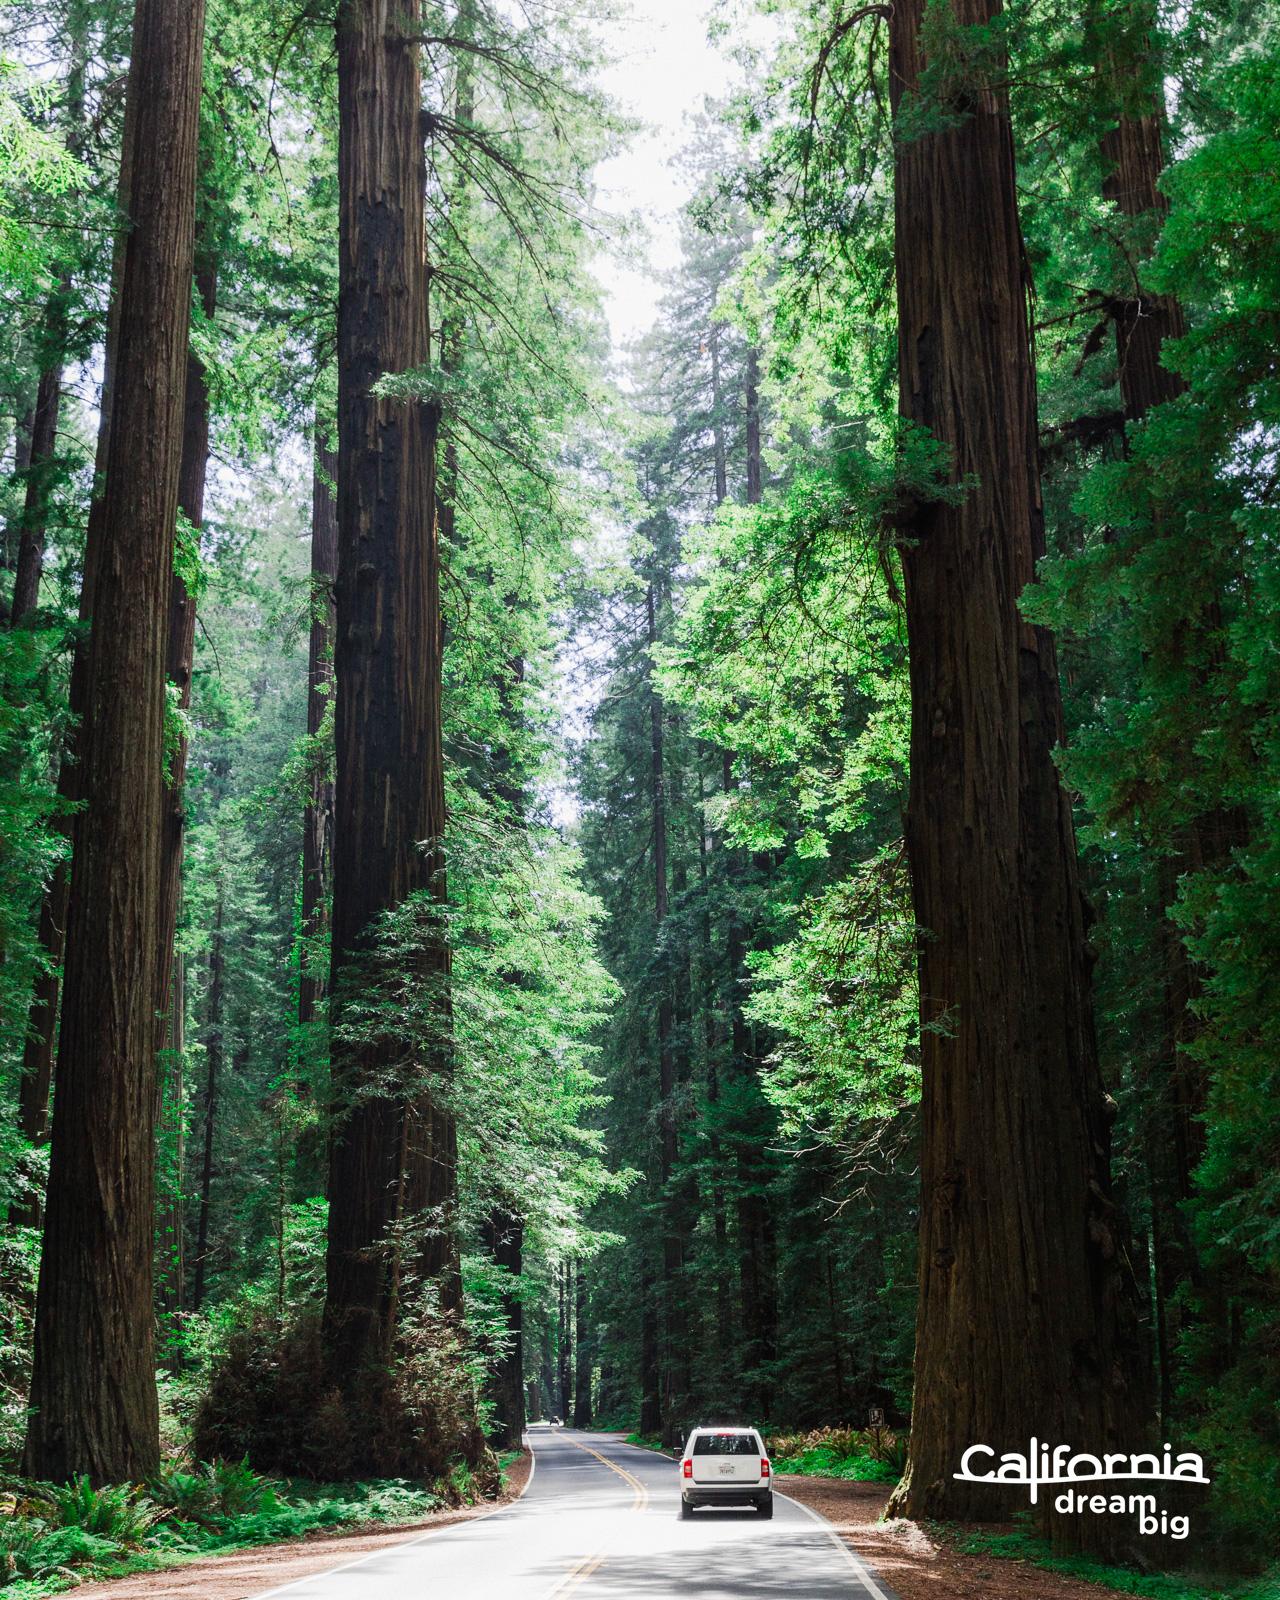 california-FinnBeales.jpg